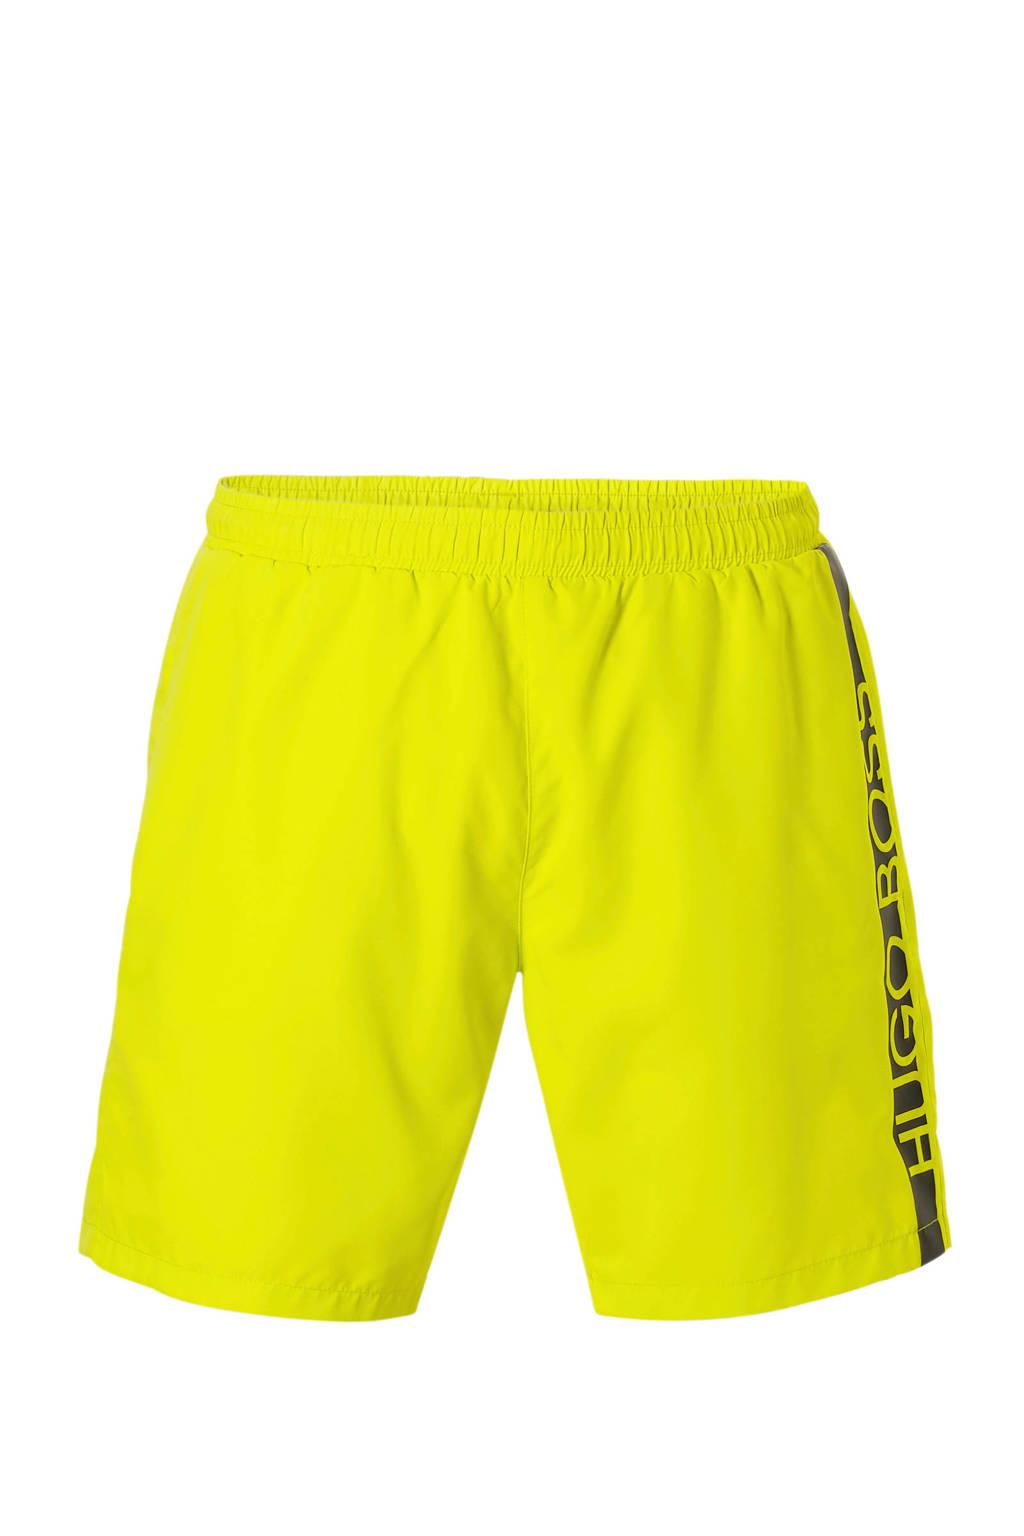 Boss zwemshort geel, Geel/zwart